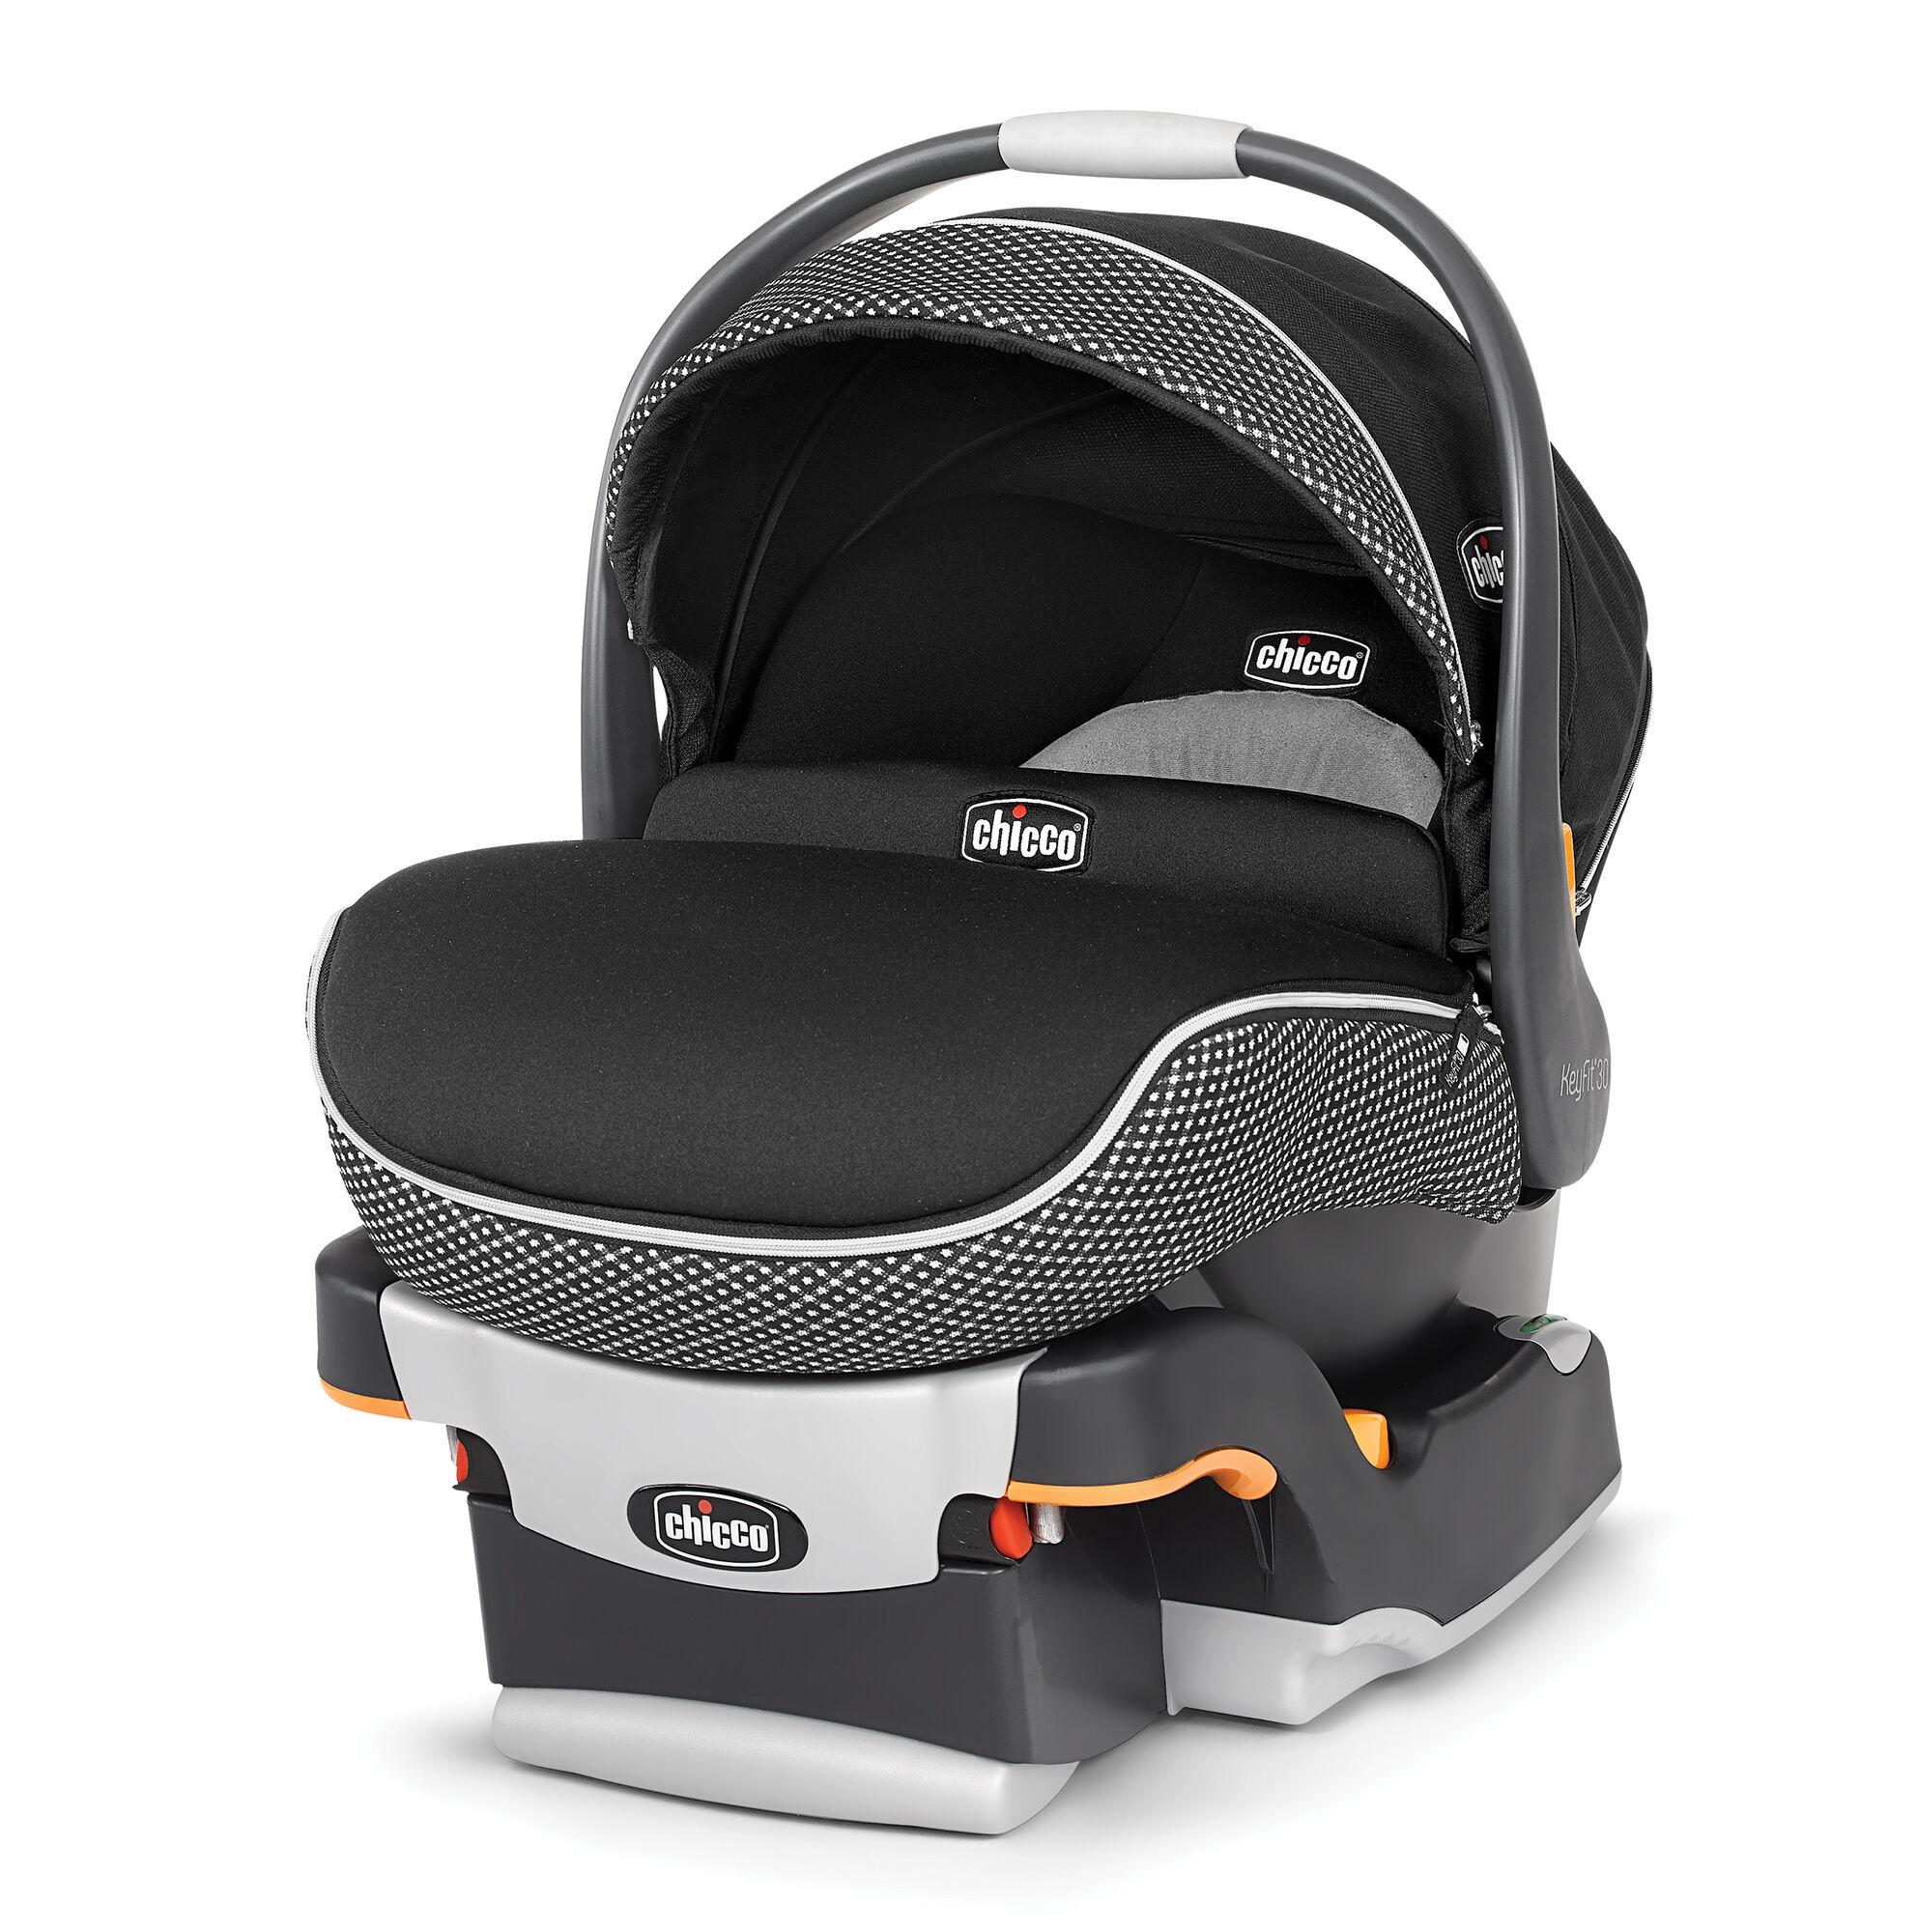 Chicco Infant Car Seat Travel Bag